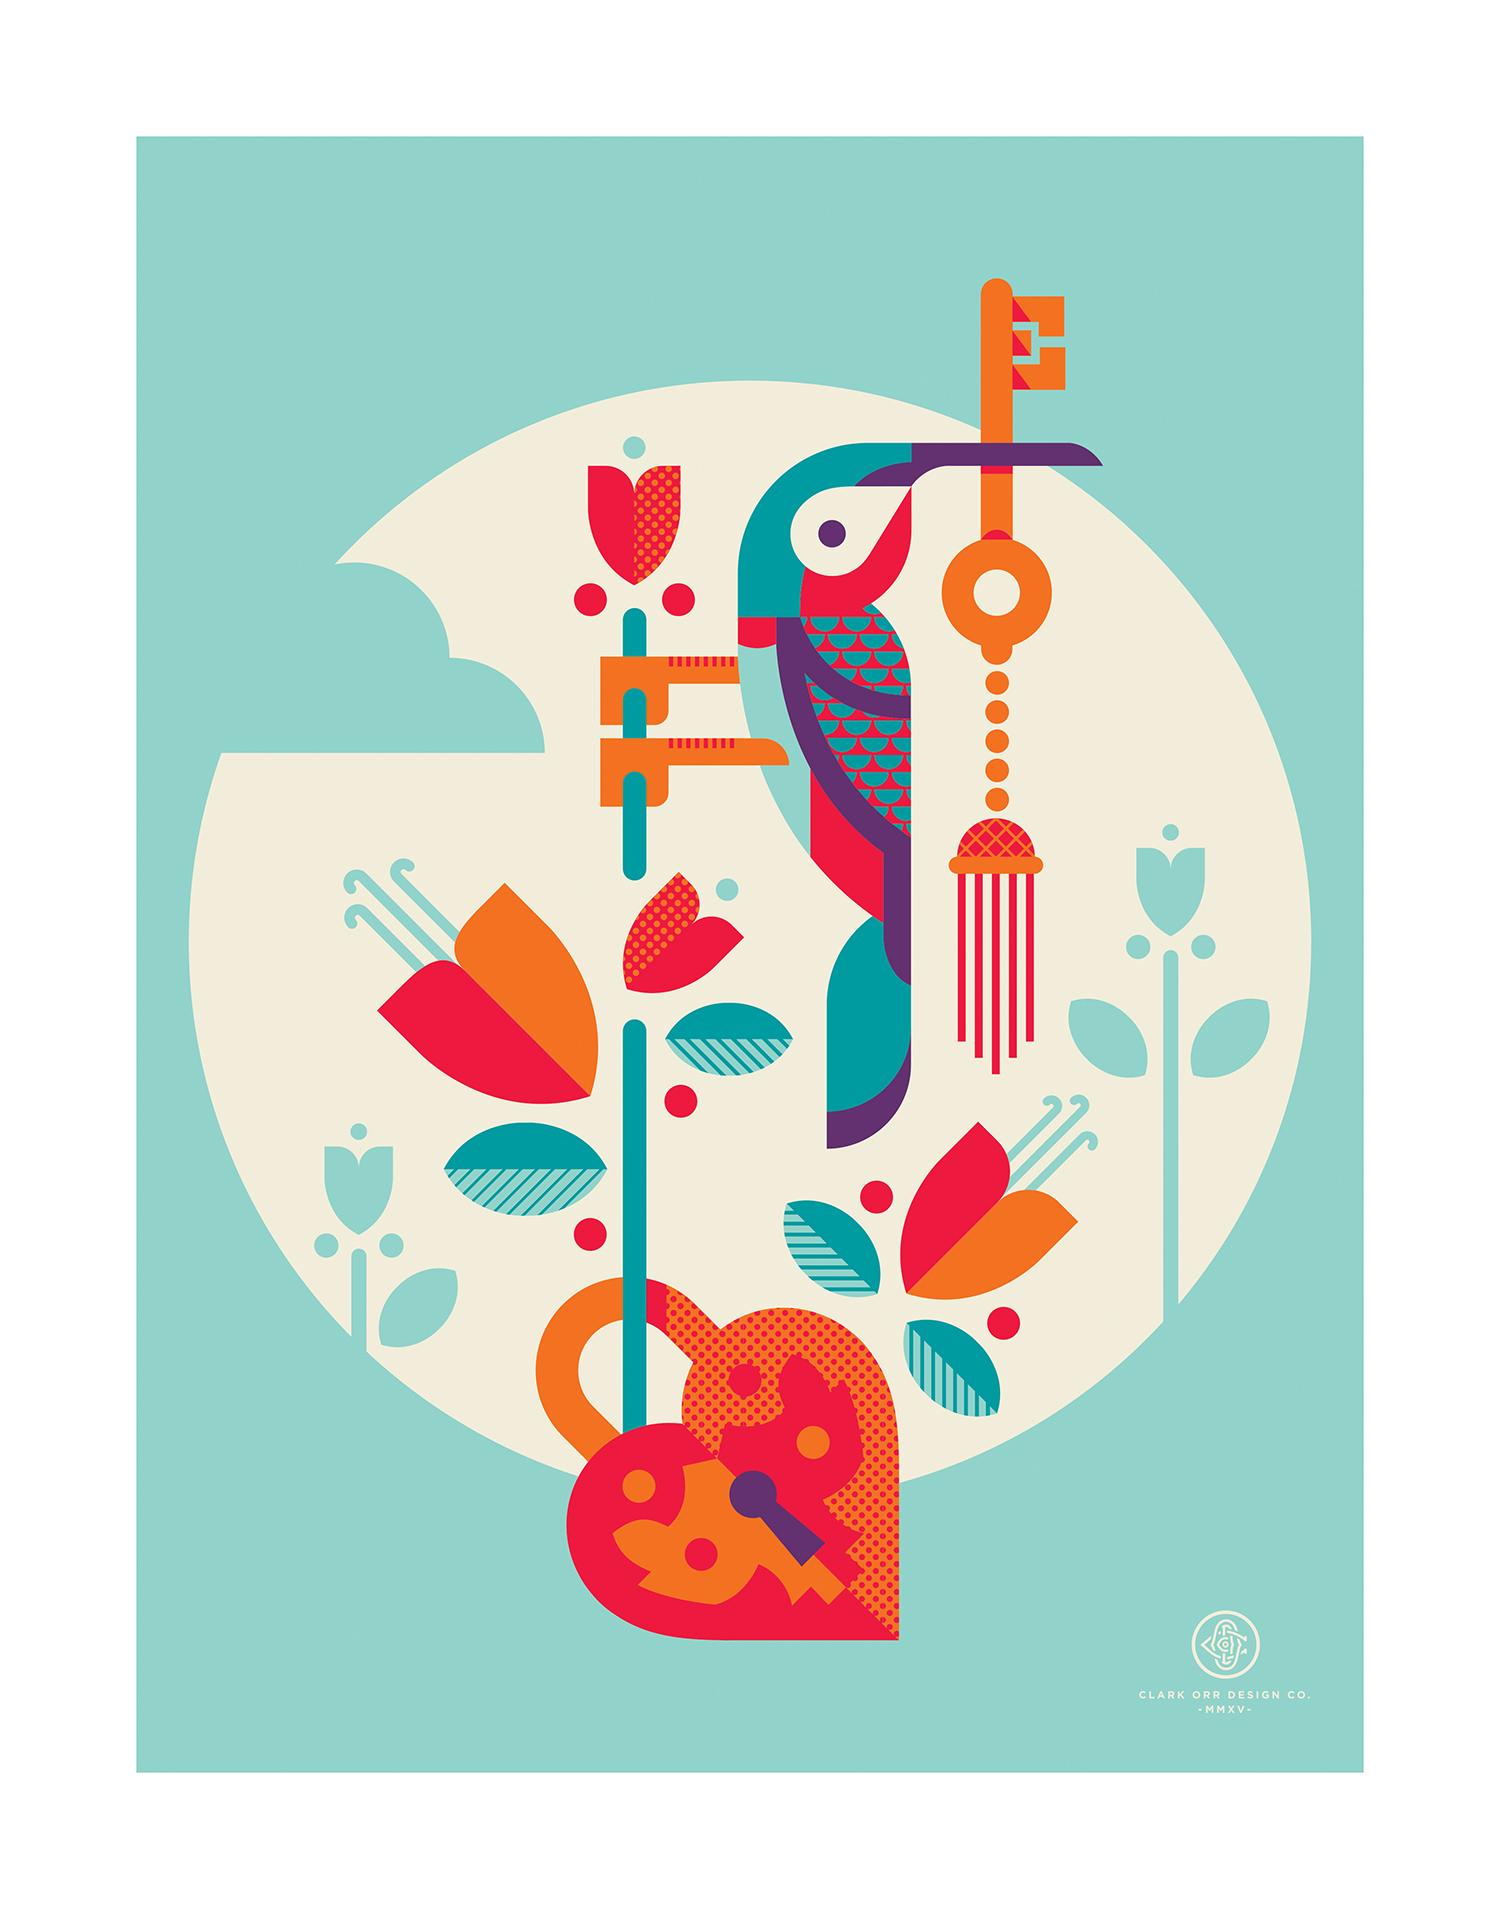 'Key' by Clark Orr